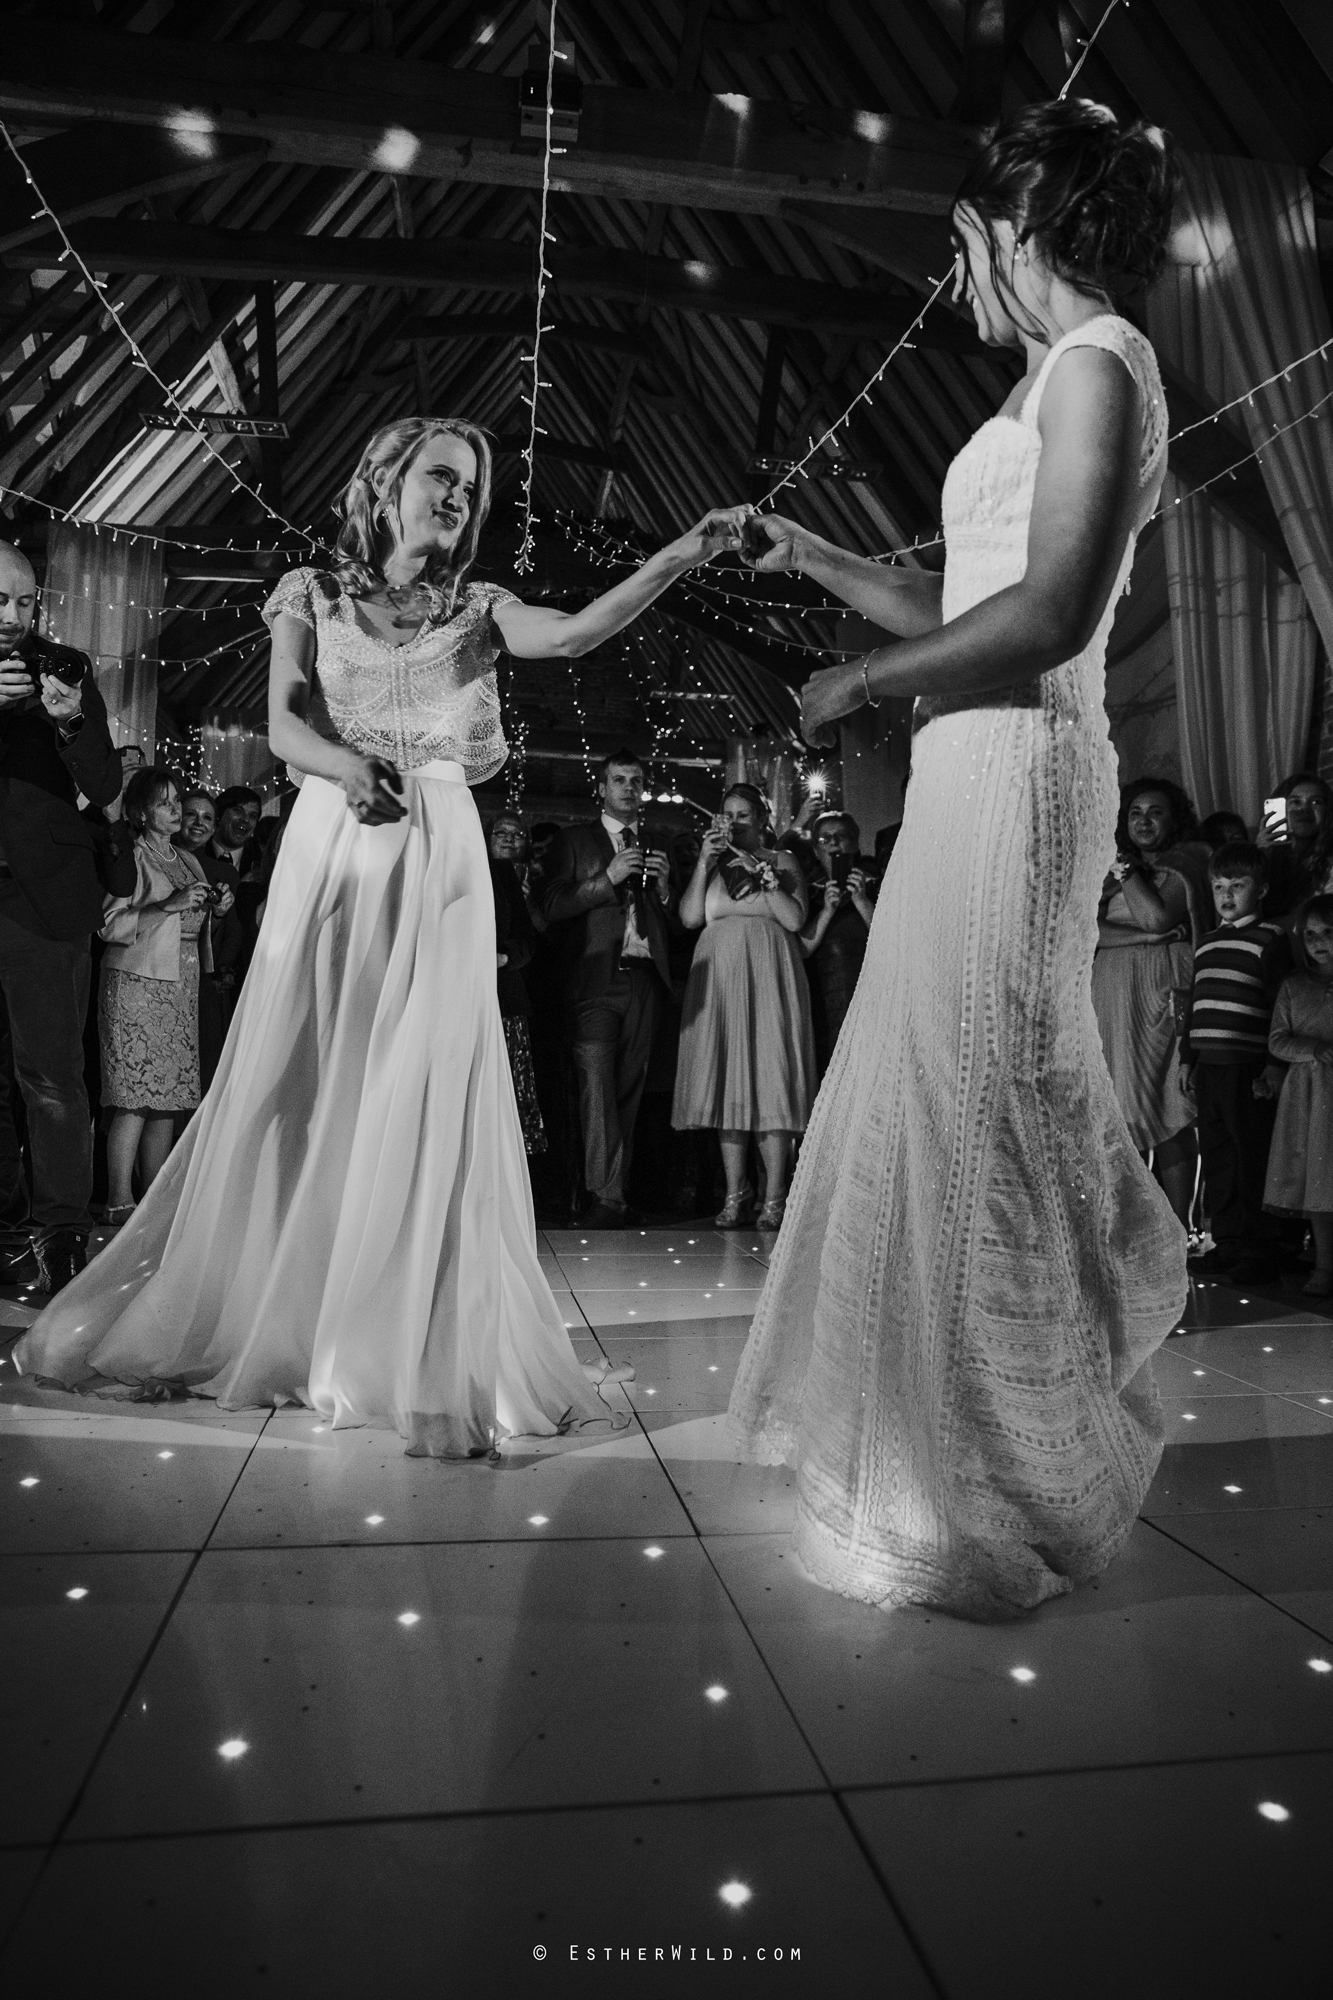 Elms_Barn_Weddings_Suffolk_Photographer_Copyright_Esther_Wild_IMG_3417-2.jpg